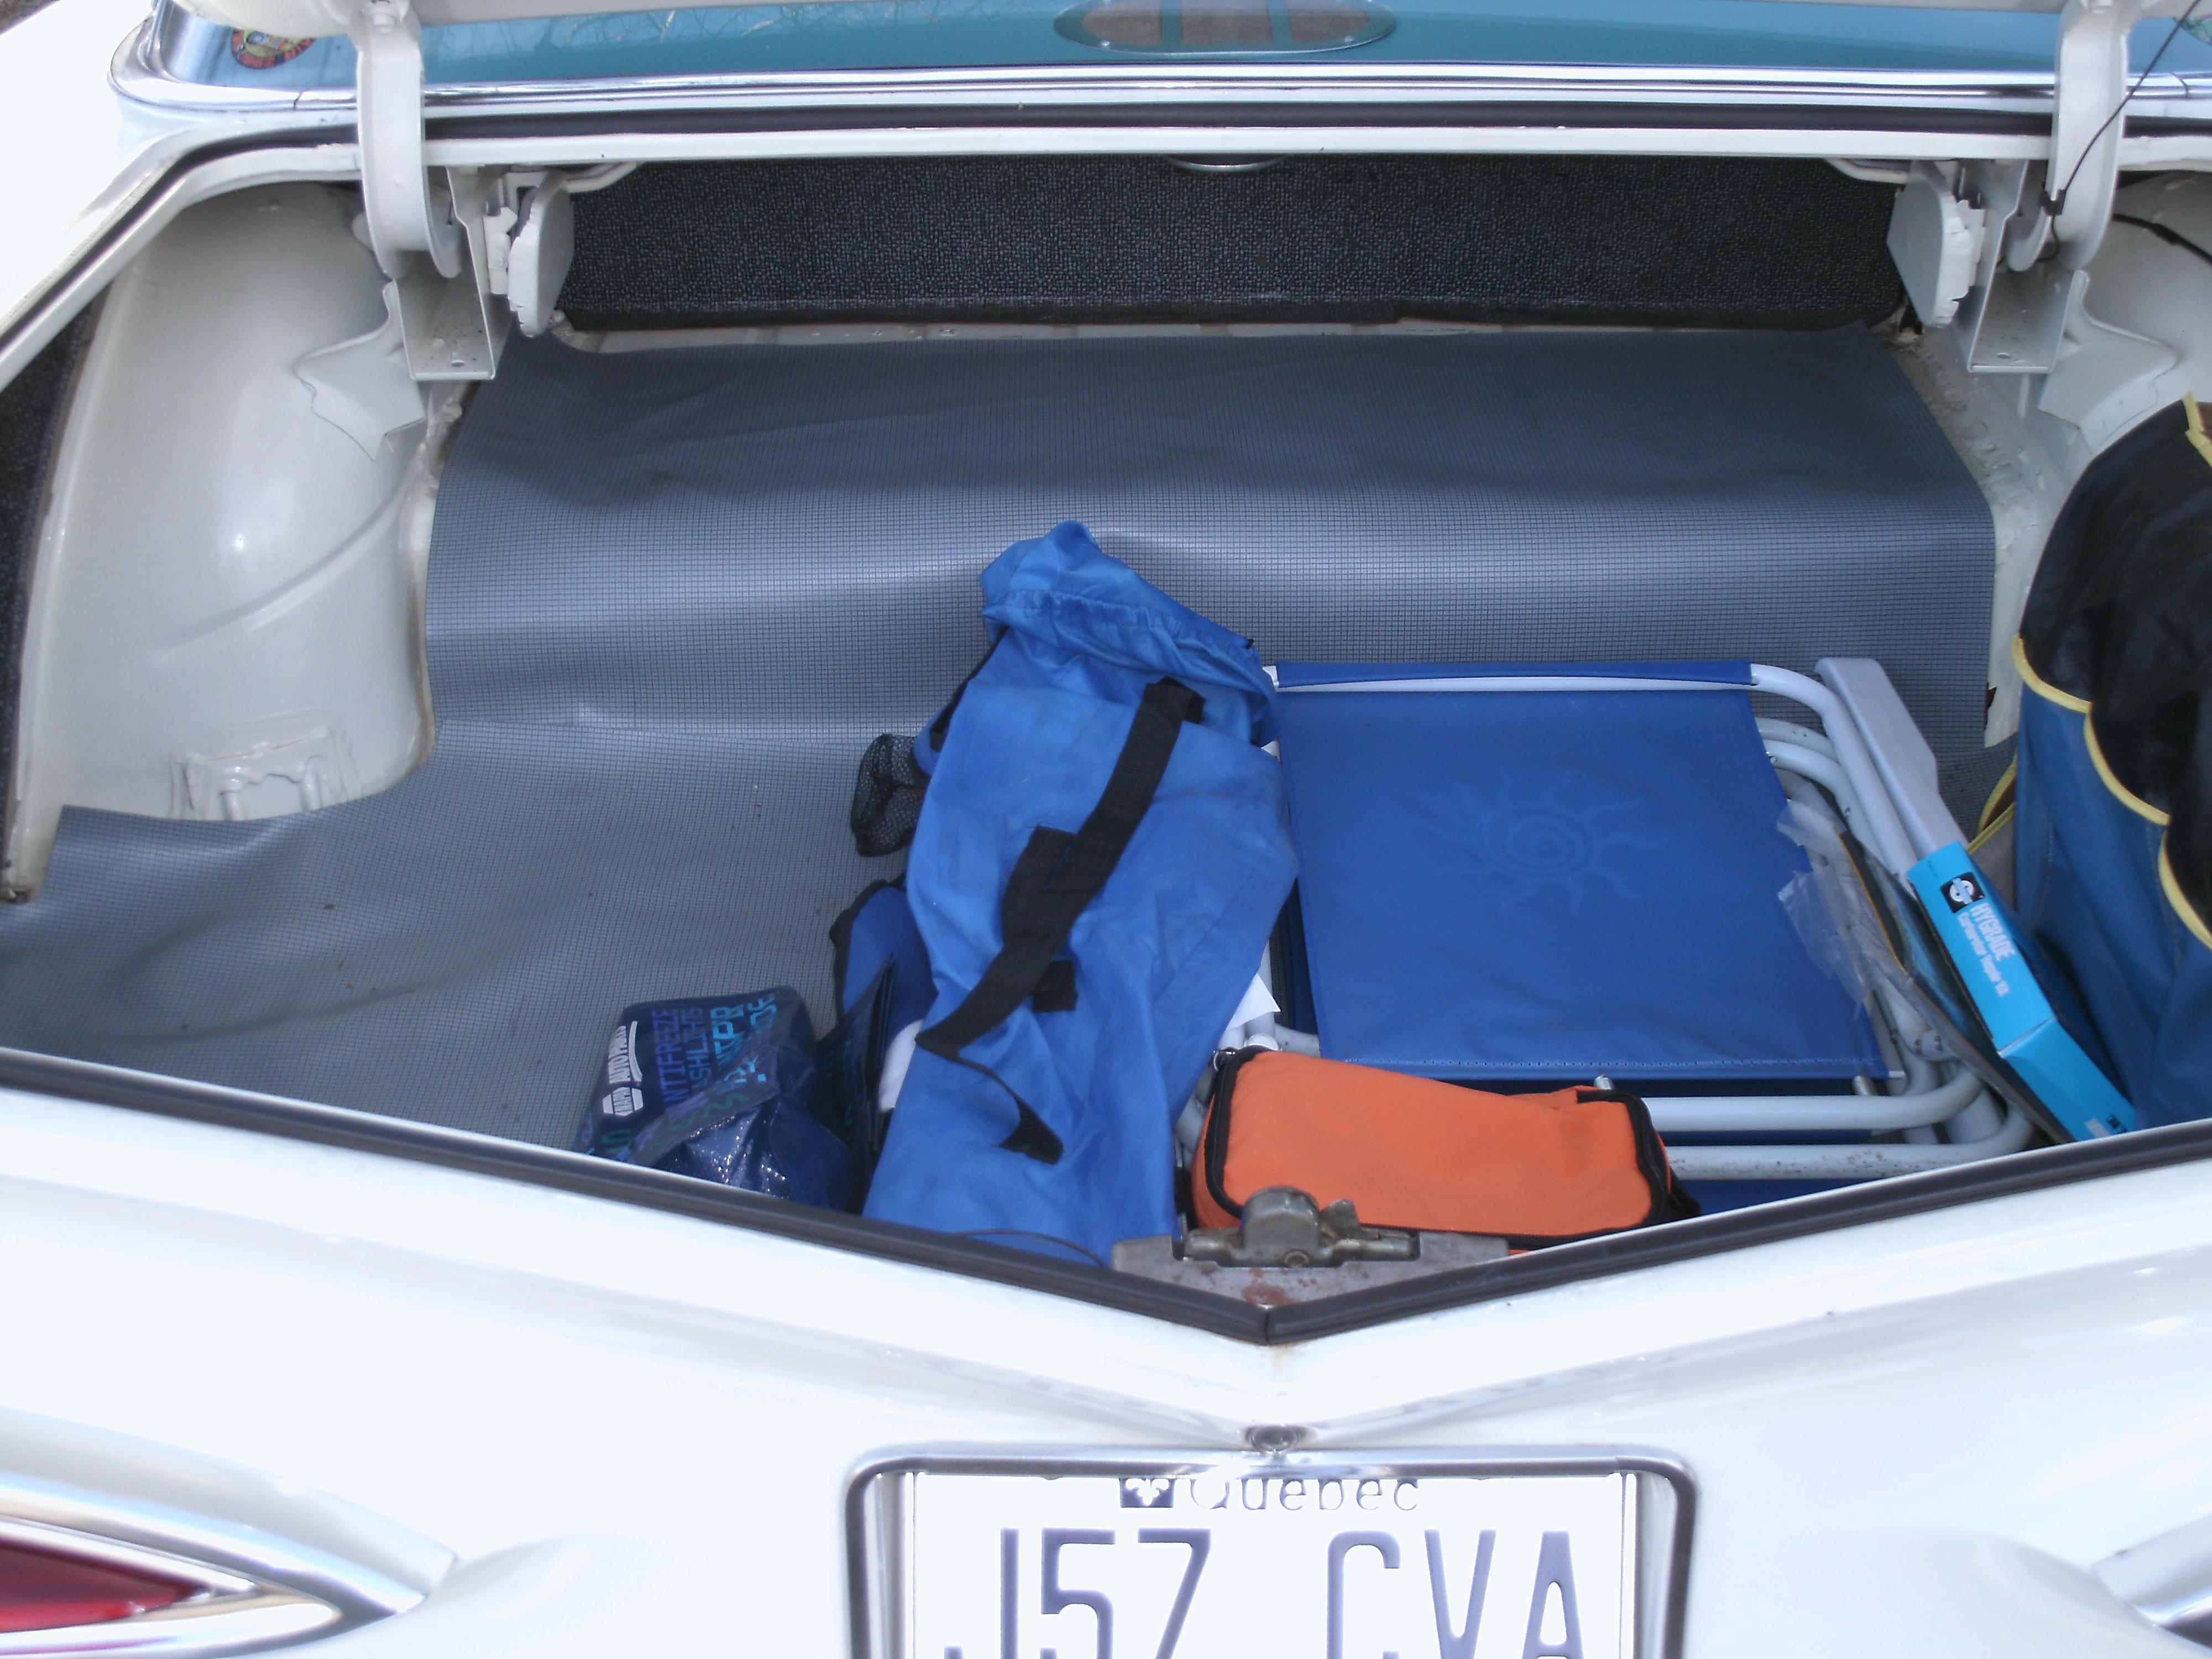 chevrolet impala 1959 a vendre 883441chevroletimpala1959014